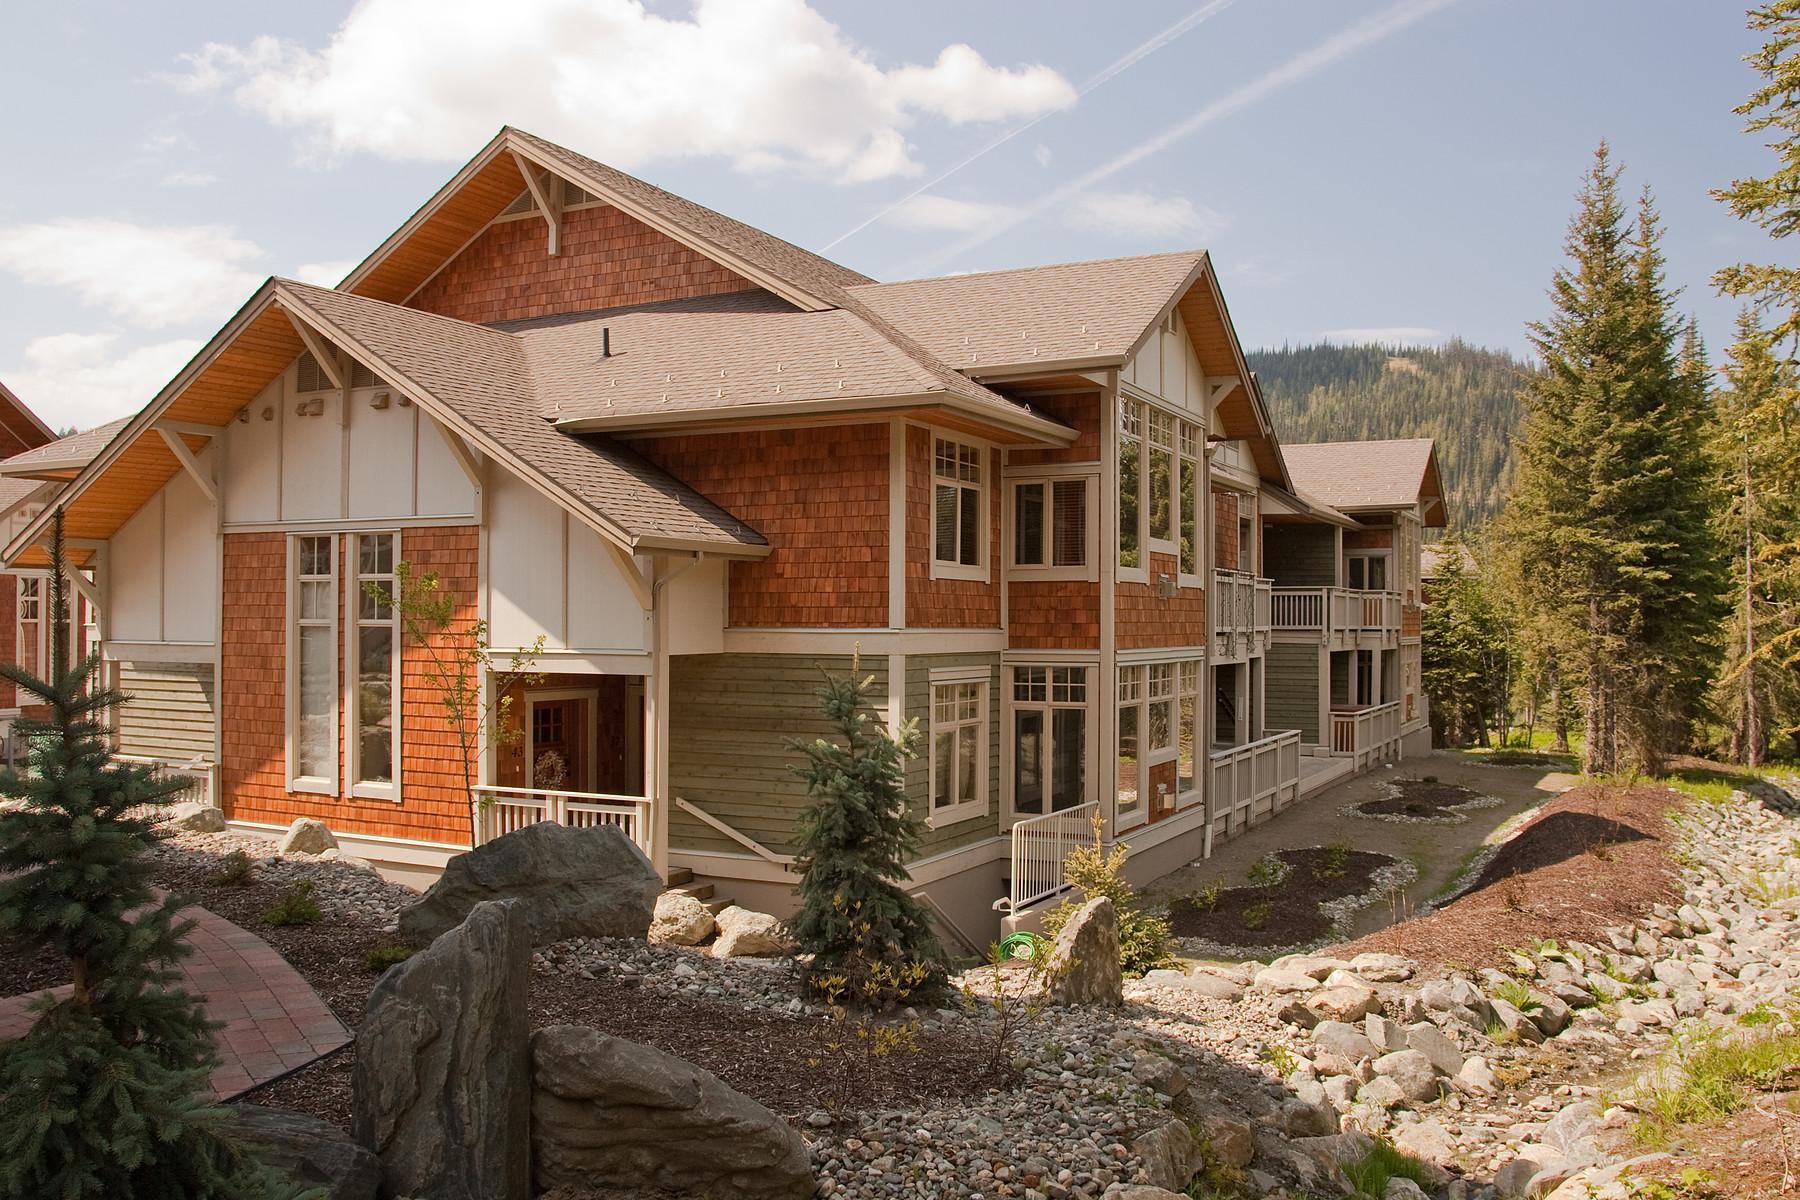 Condominium for Sale at Overlooking the 16th Fairway Sun Peaks, British Columbia V0E 5N0 Canada